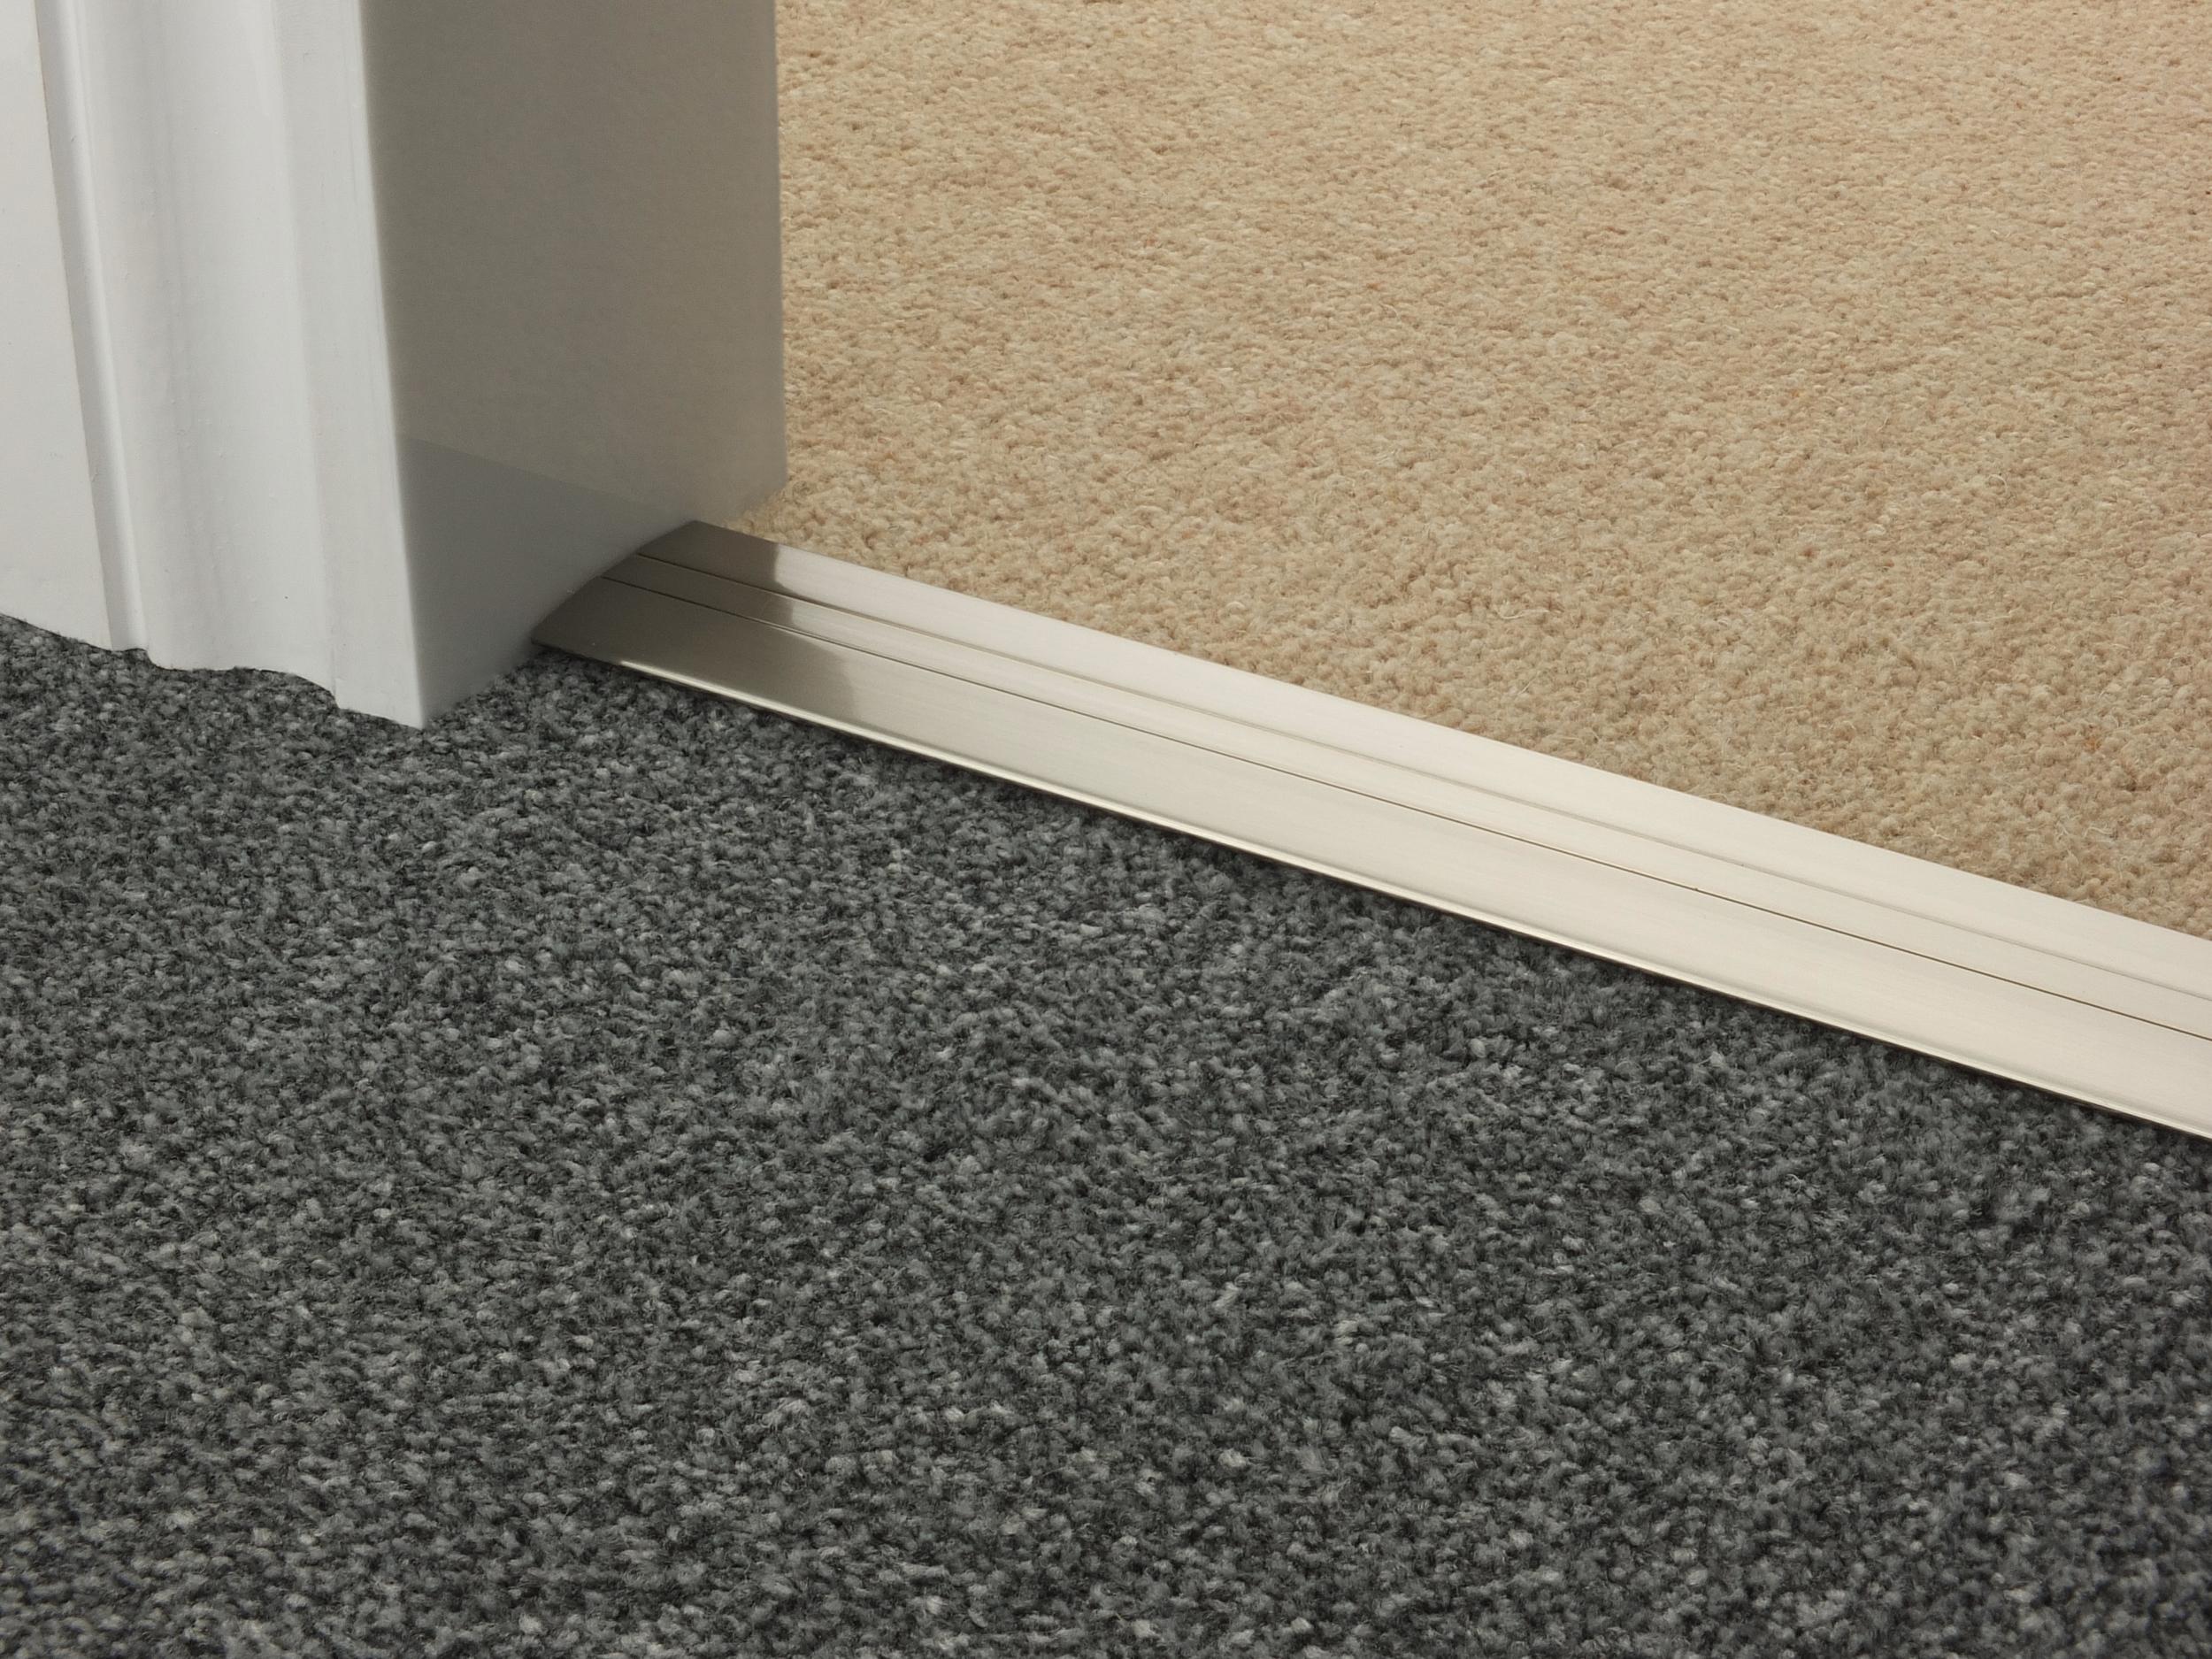 door_bar_satin_nickel_posh38_carpet_carpet.jpg